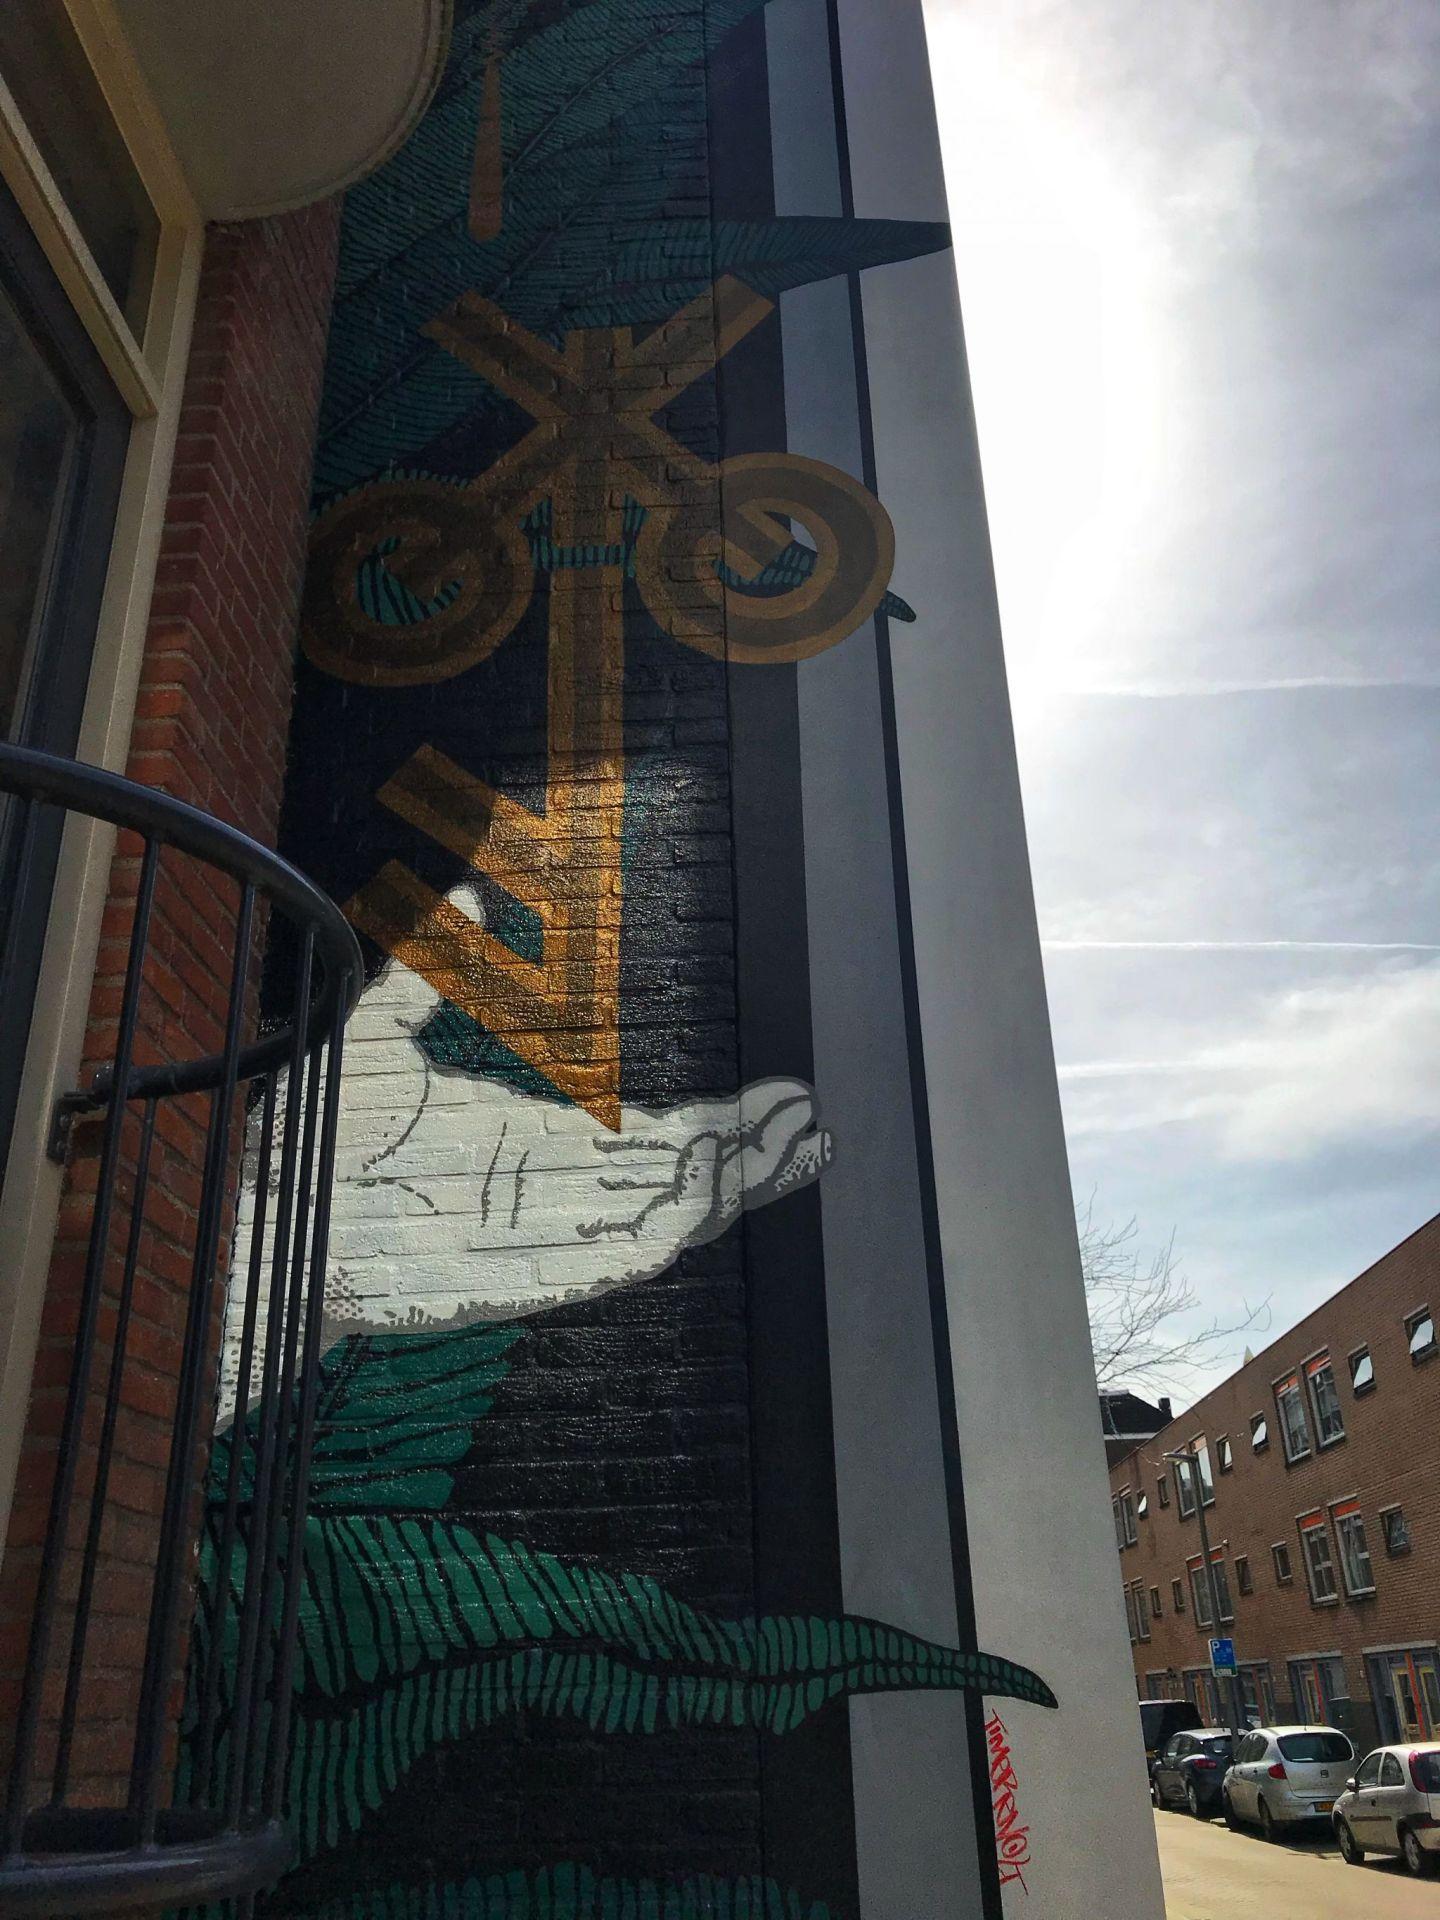 I've got the key Rotterdam street art